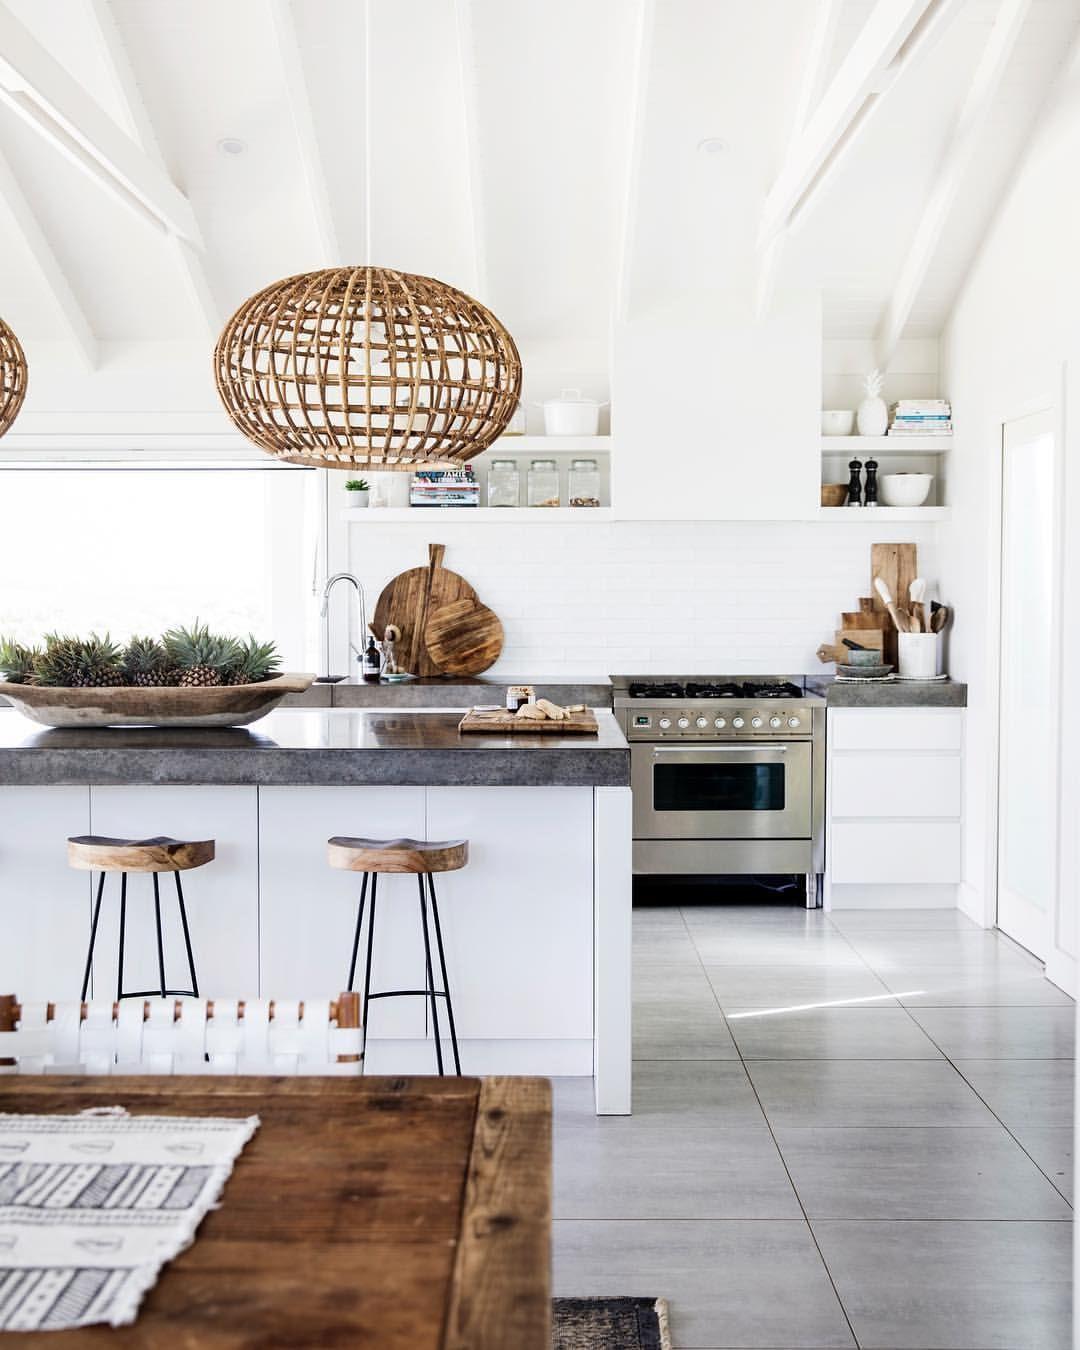 Beach house kitchen bohemian kitchen exposed beam kitchen dream